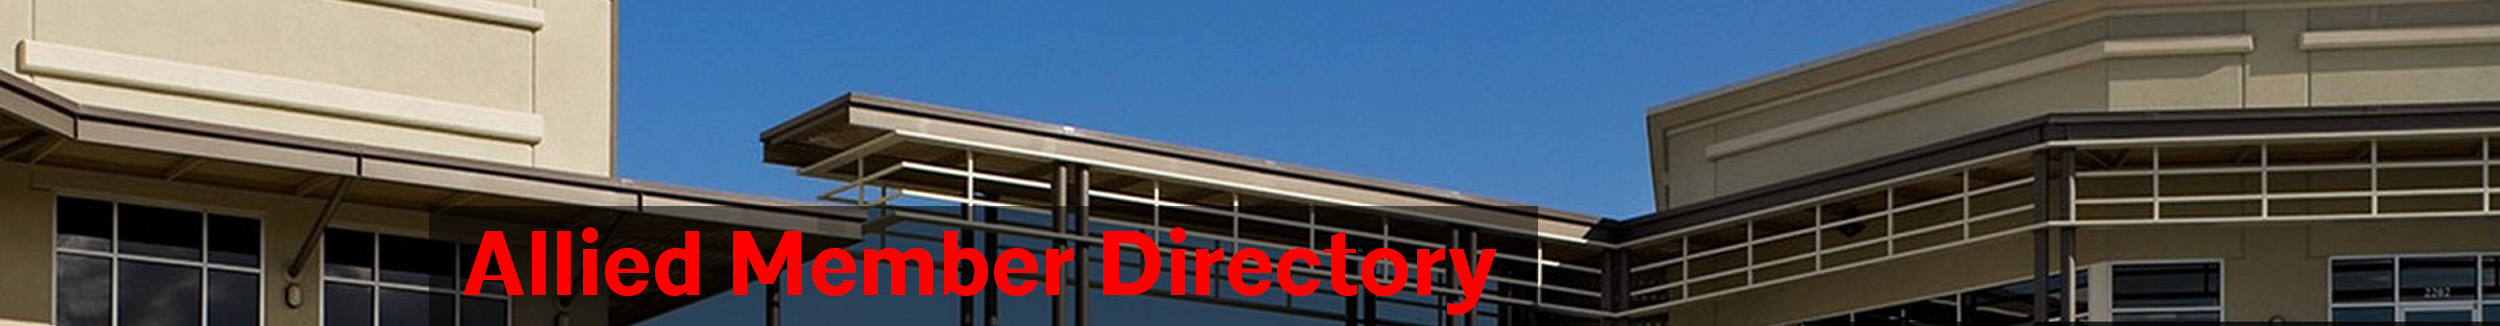 Allied Member Directory Aia San Antonio